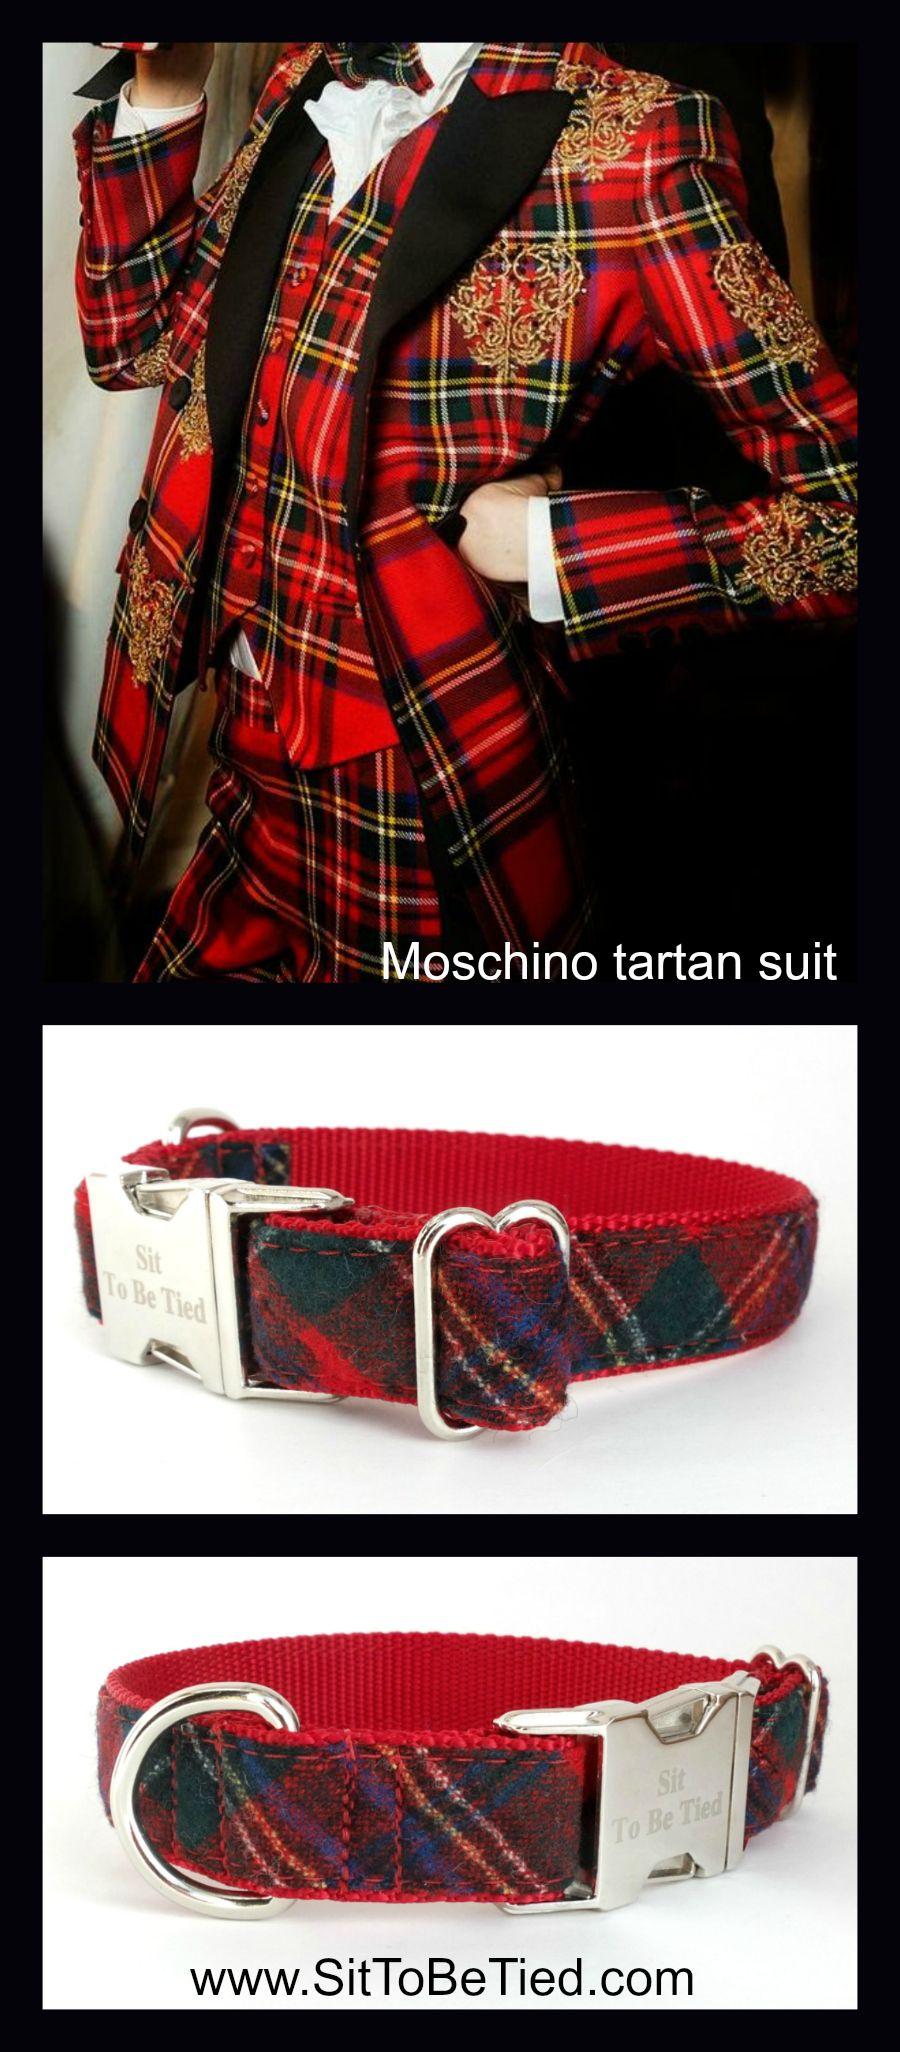 #Tartan dog collar. Tartan fashion. For her: Moschino tartan suit.  For the dog: Christmas dog collar in red tartan, upcycled wool necktie. $27.99